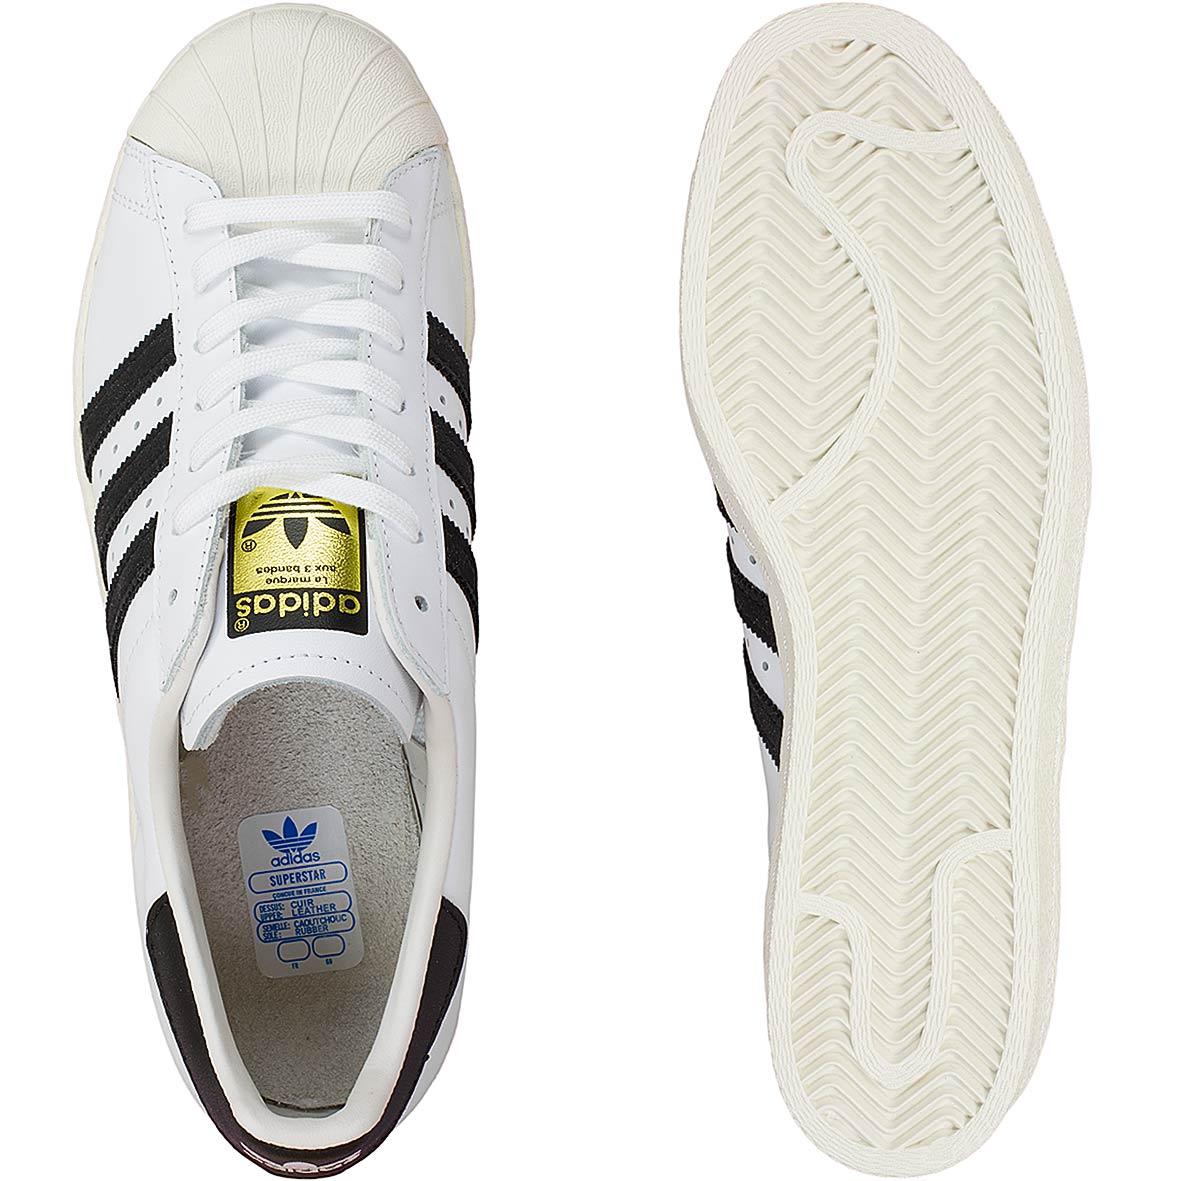 100% authentic 22e43 6a1a7 Adidas Originals Sneaker Superstar 80s weiß schwarz